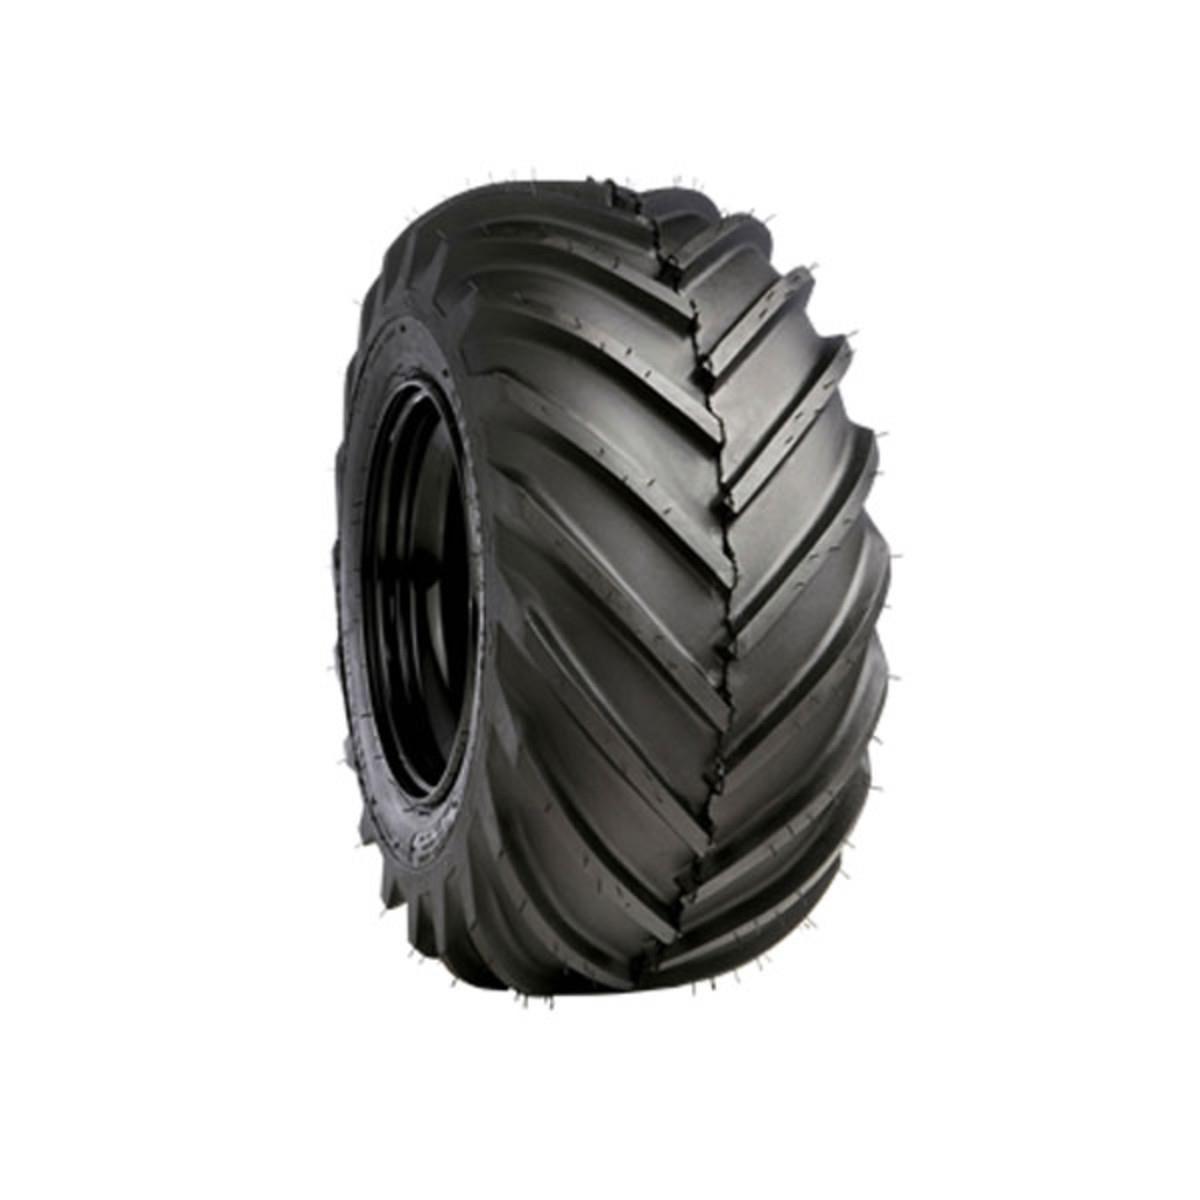 Goodyear 38x20.00-16.1 Wheels / Tires / Track